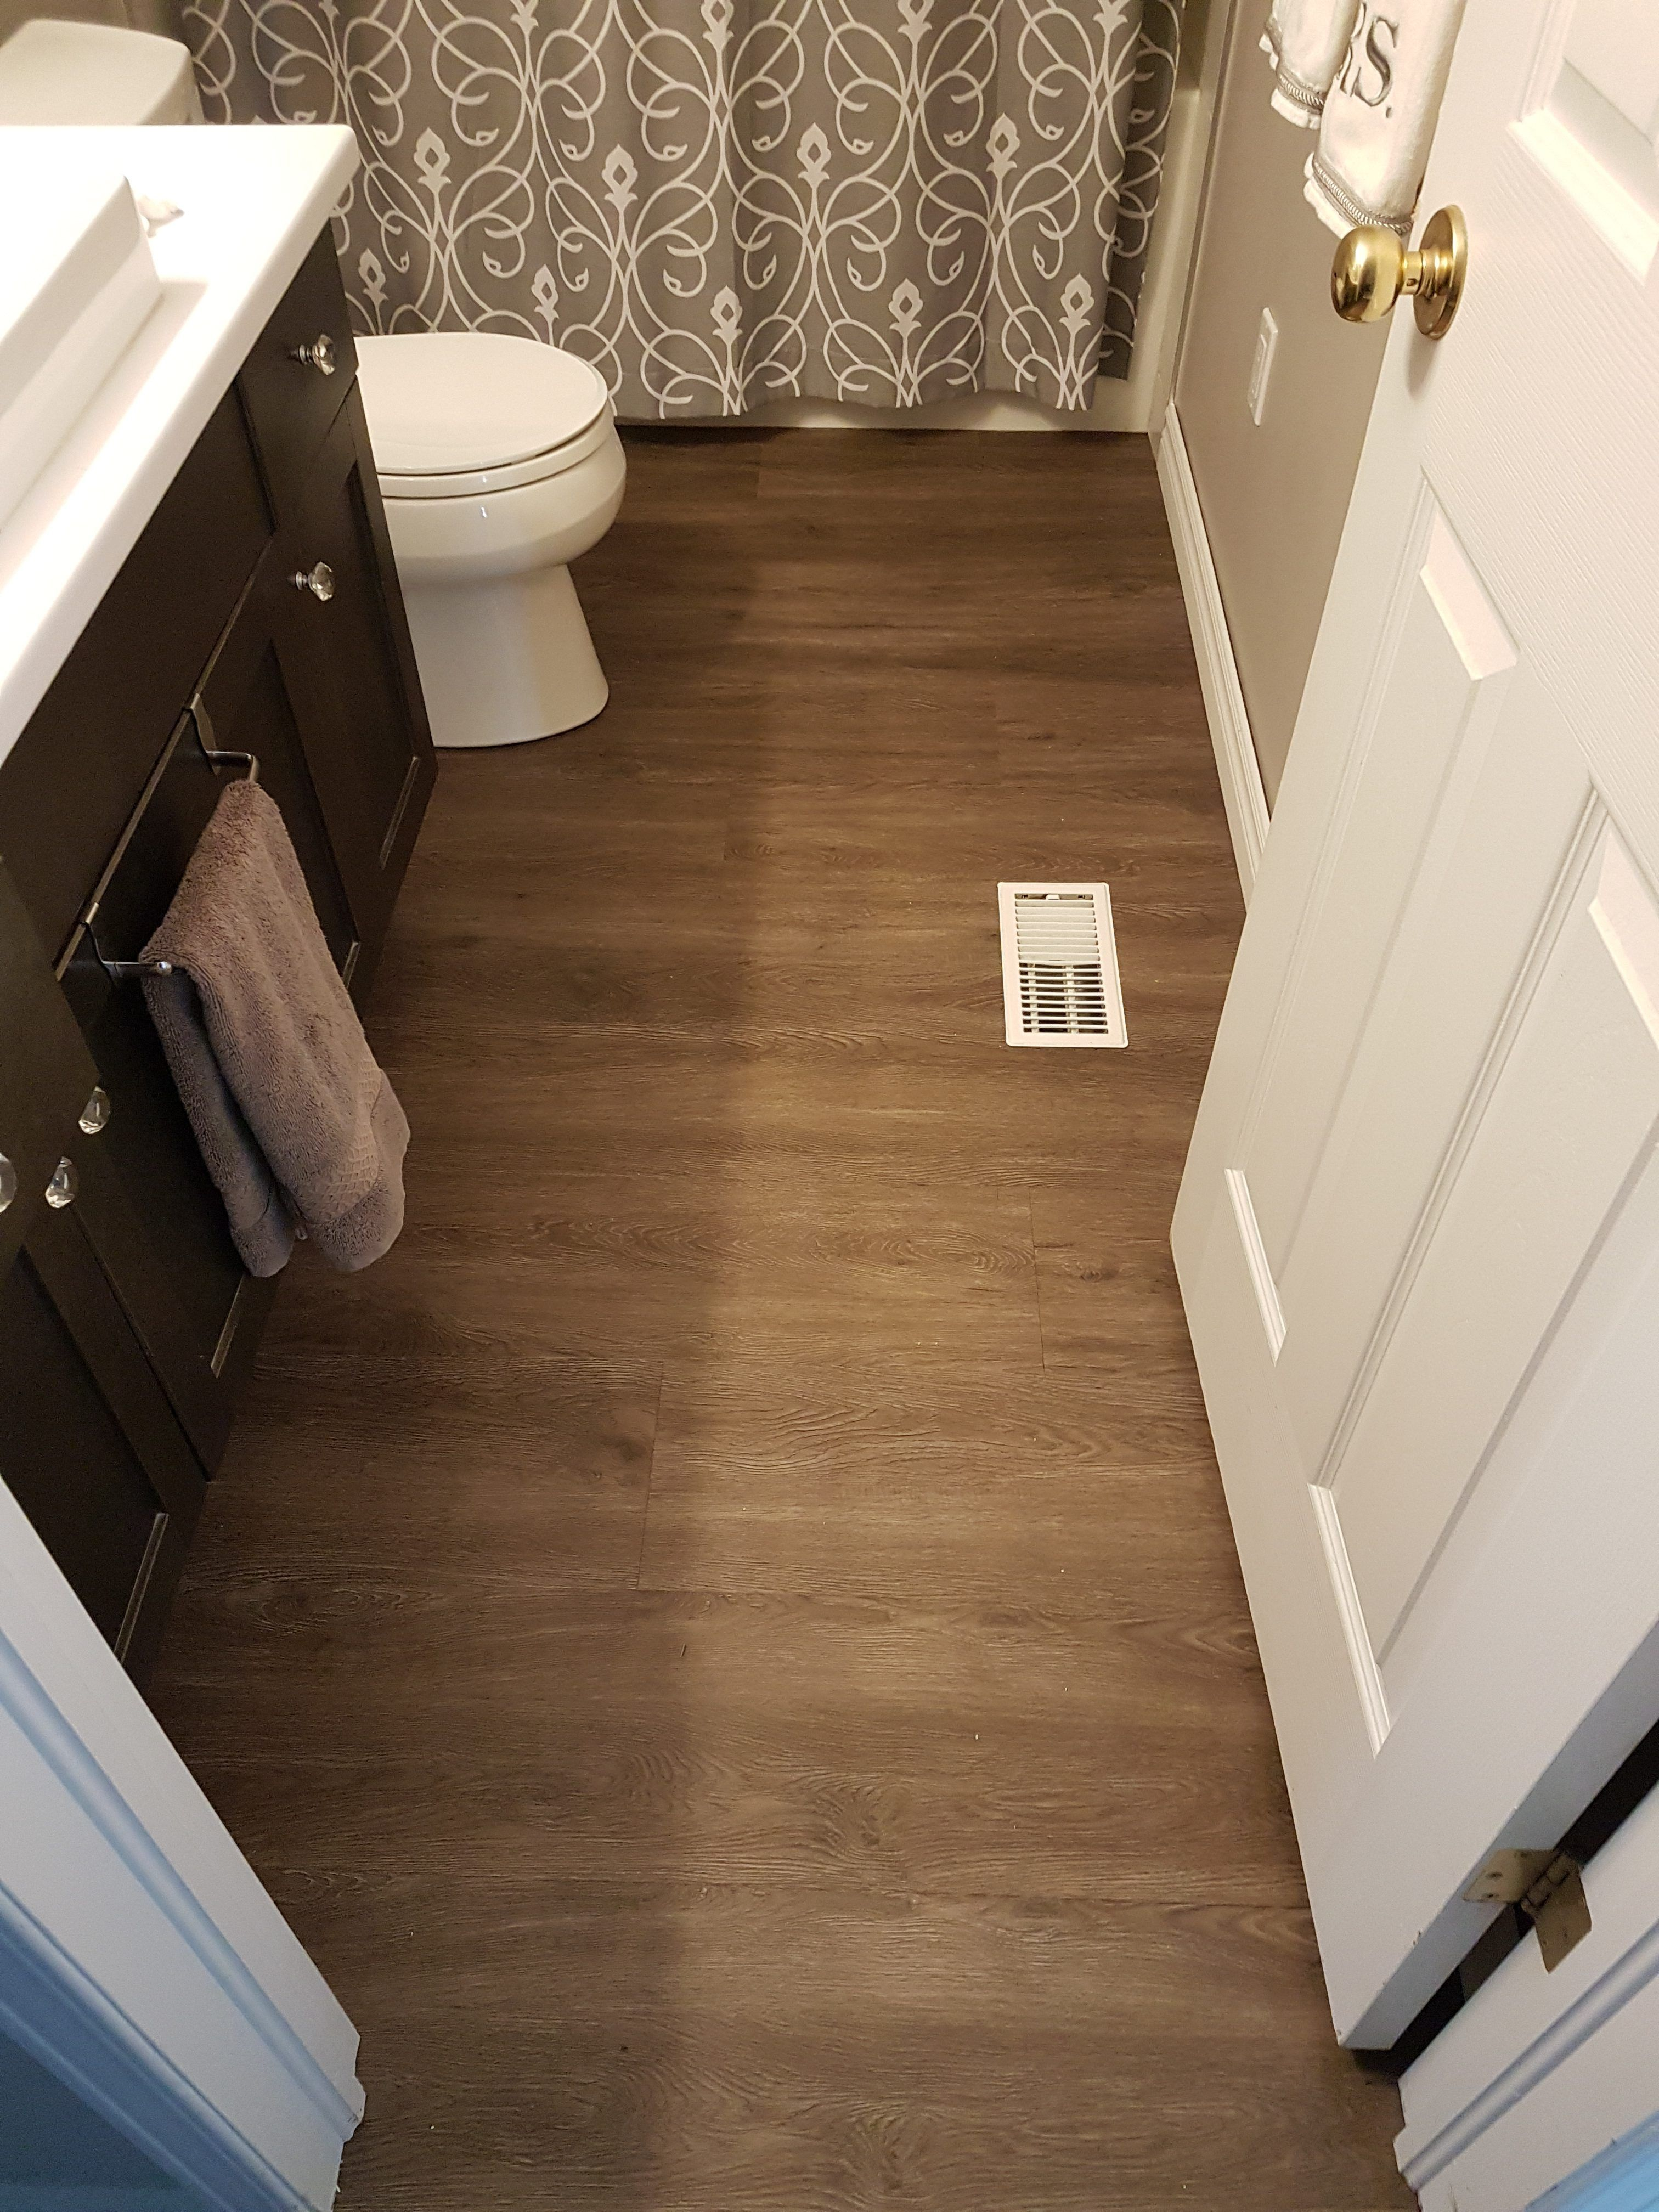 Installing Luxury Vinyl Plank In A Bathroom After Lvp